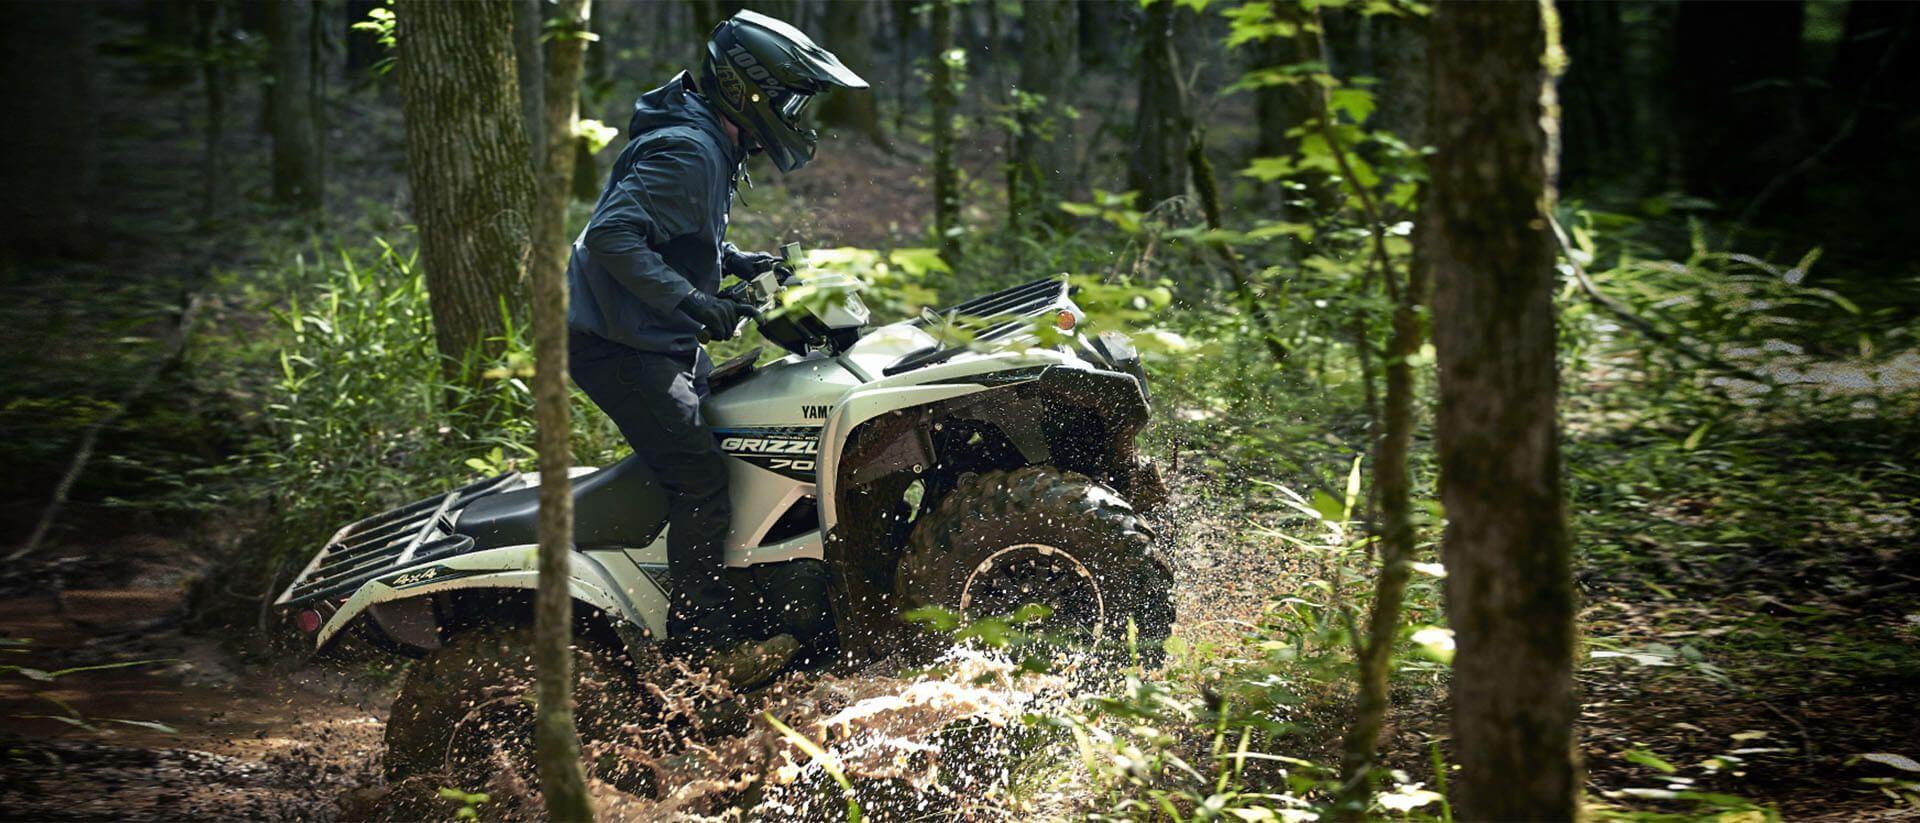 Meyer Yamaha: ATV, Snowmobile, Motorcycle, PWC Dealers   UP